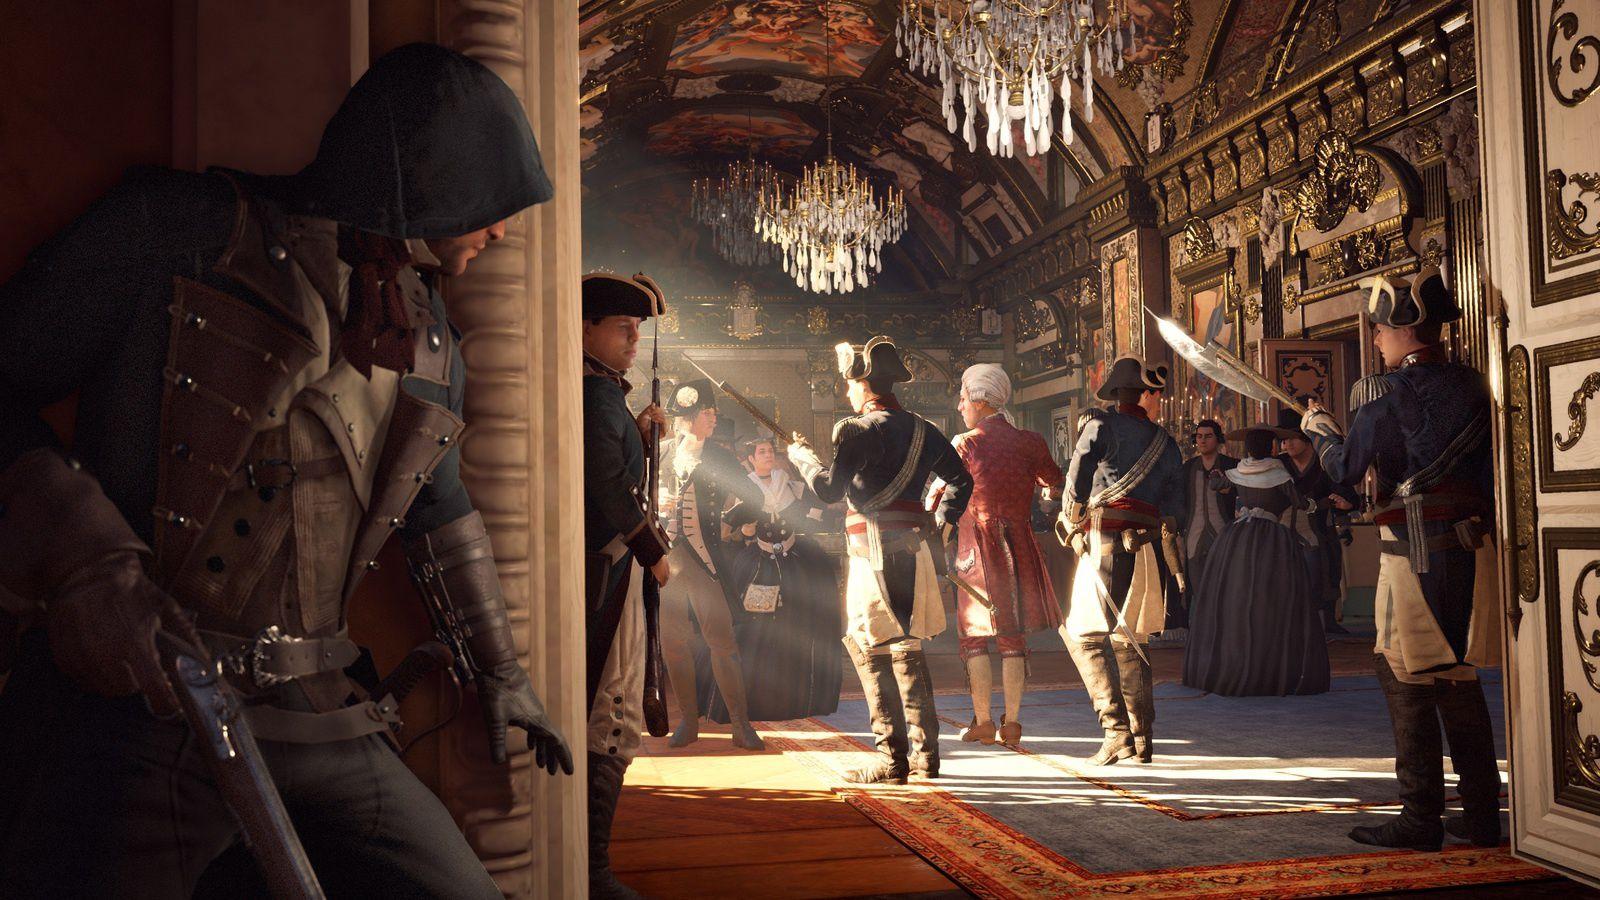 [CRITIQUE/TEST] Assassin's Creed Unity